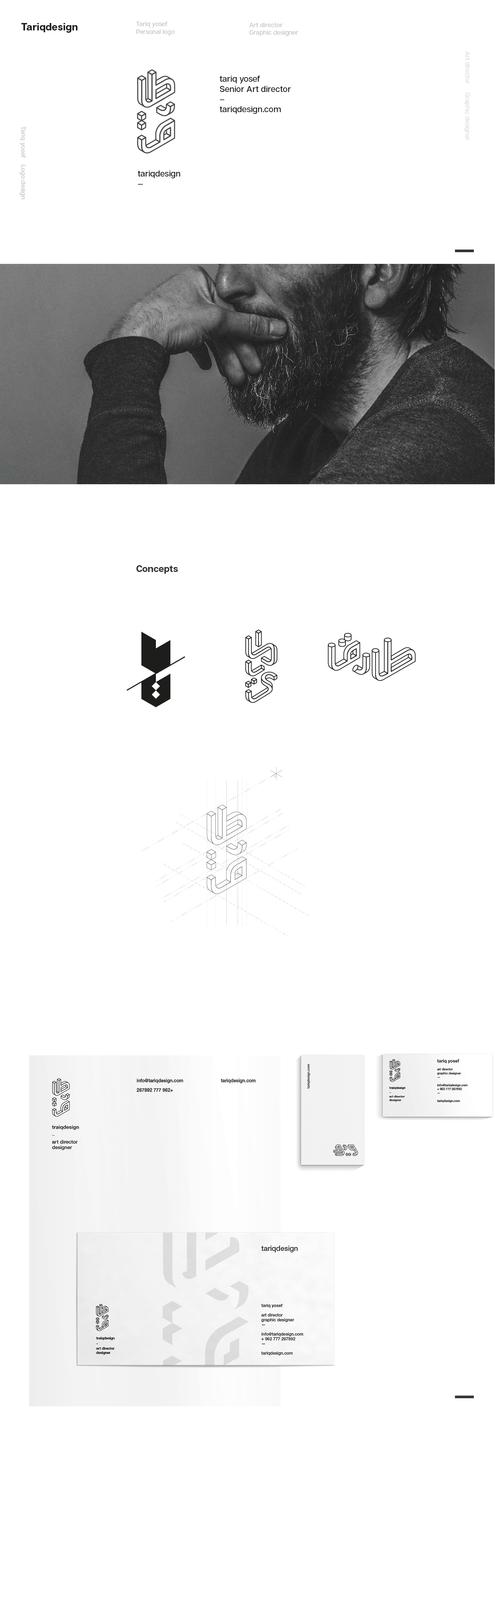 peronsal brand by tariqdesign